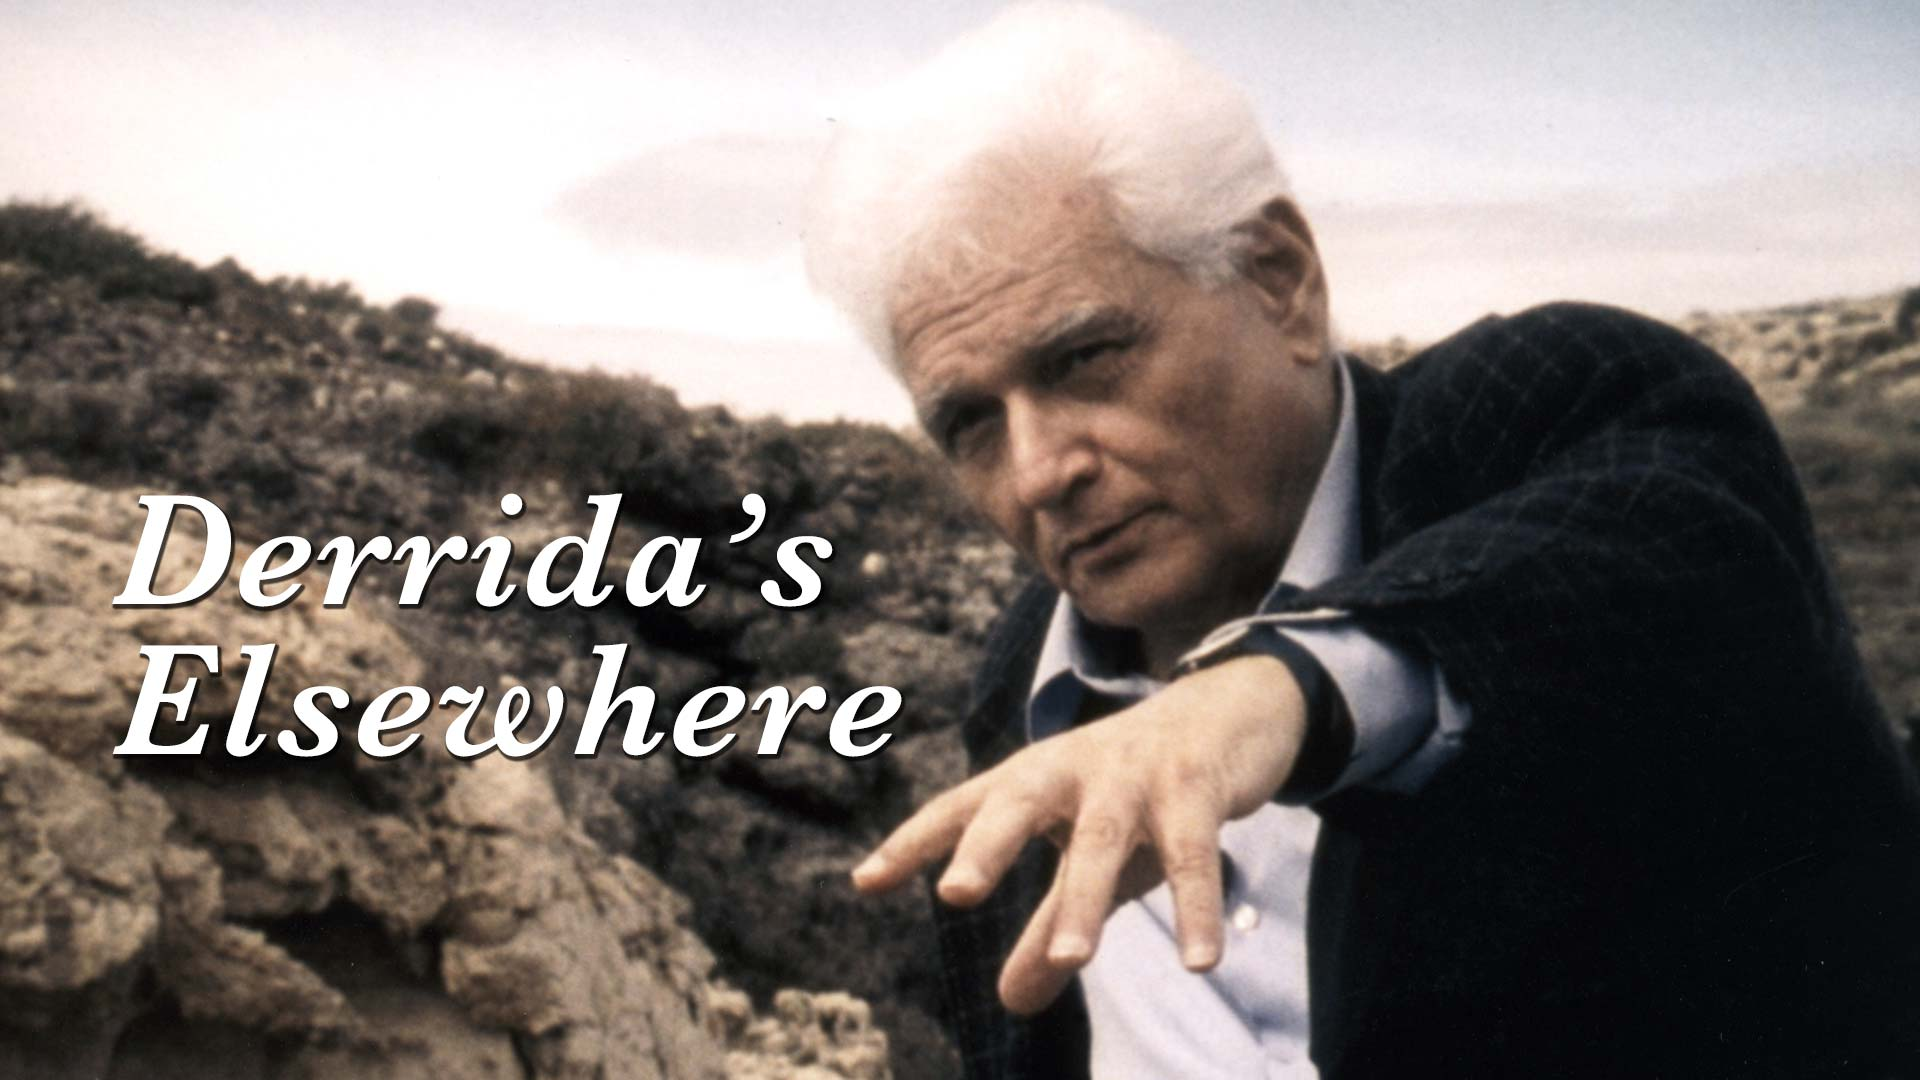 Derrida's Elsewhere - image